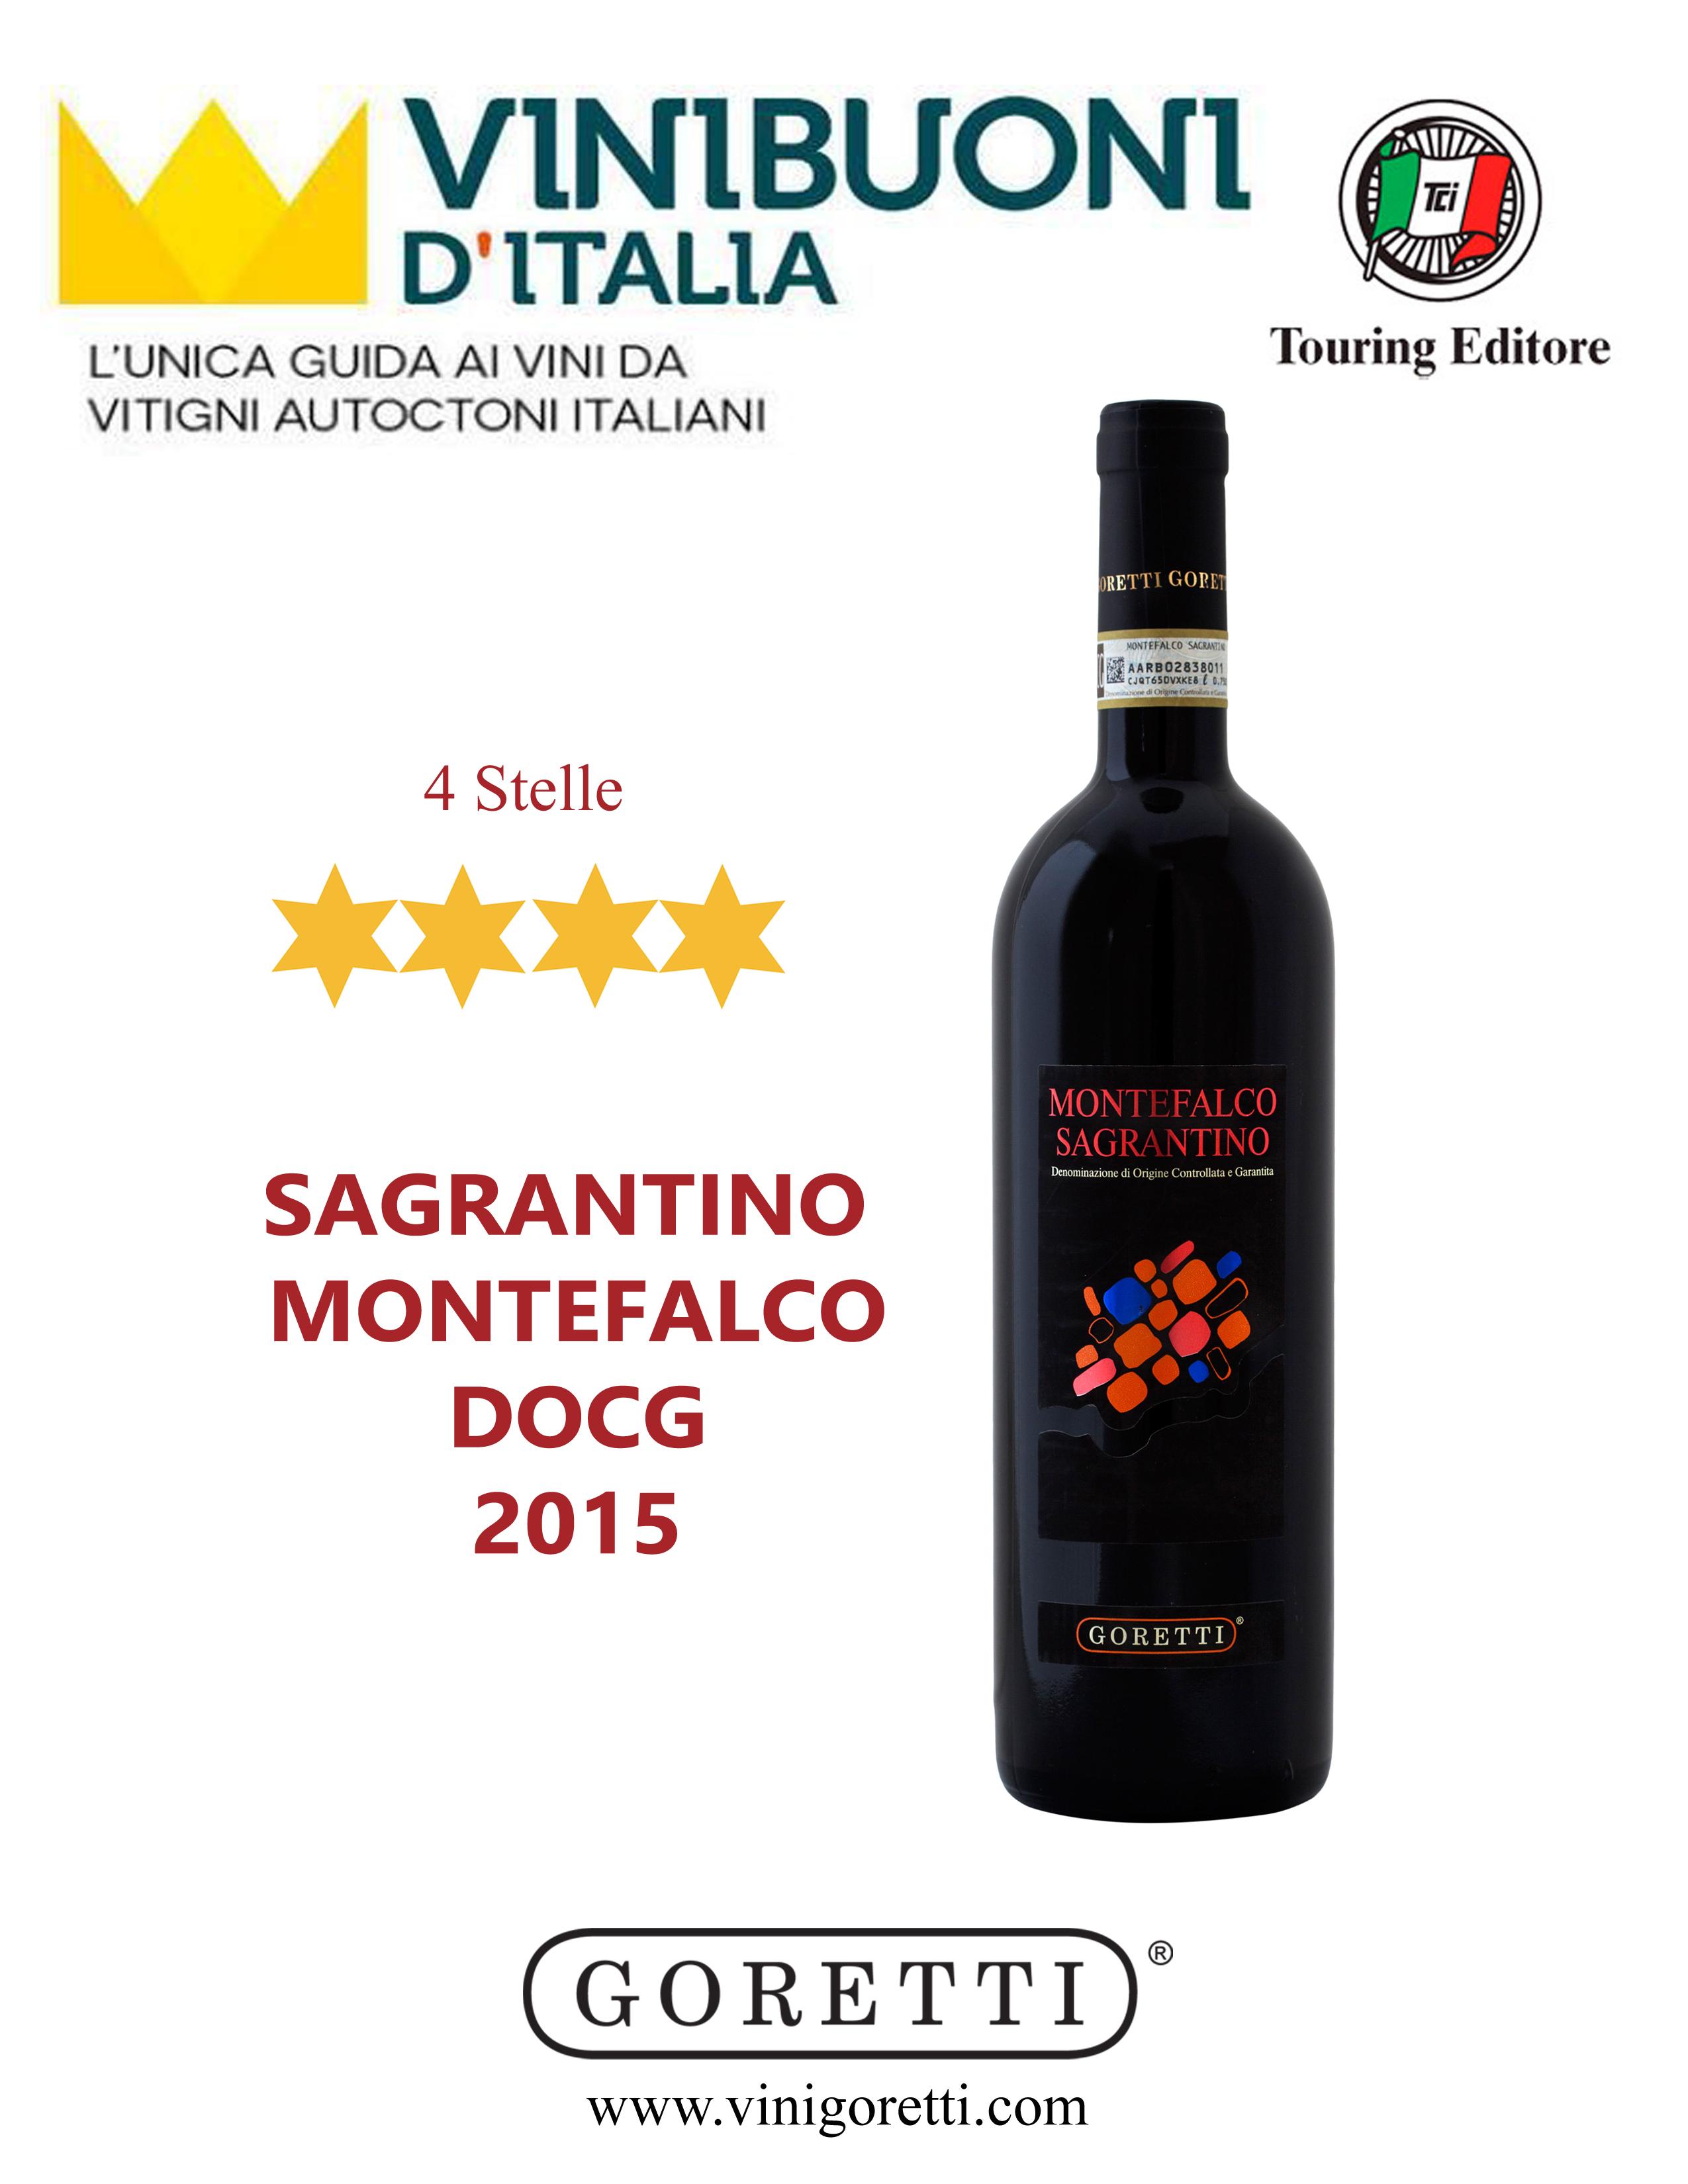 Sagrantino Montefalco DOCG 2015